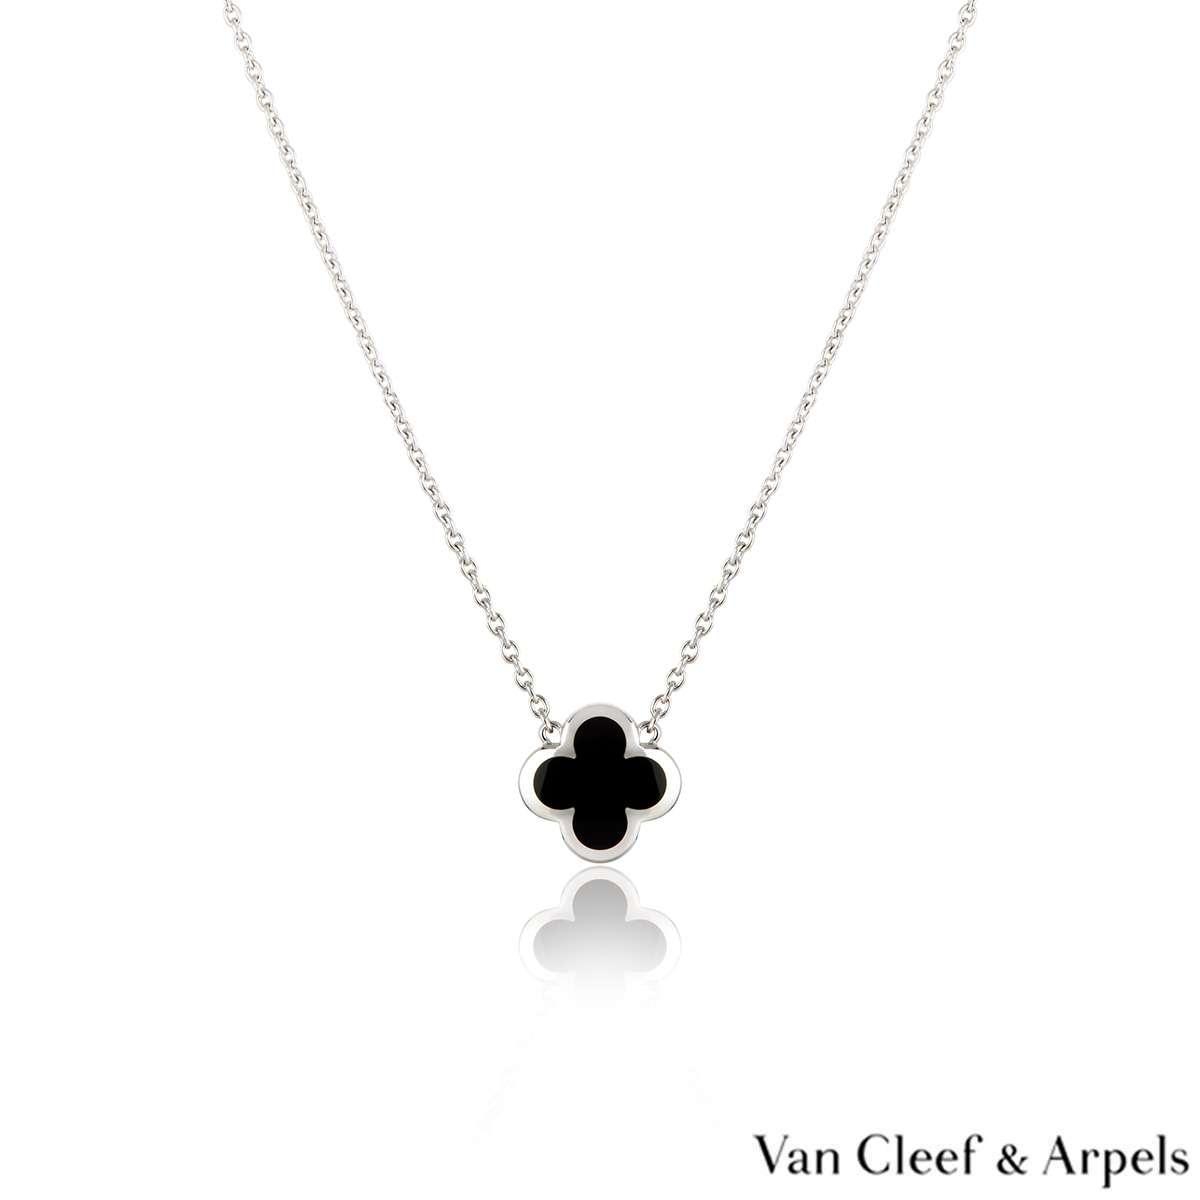 Van Cleef & Arpels White Gold Onyx Pure Alhambra Pendant